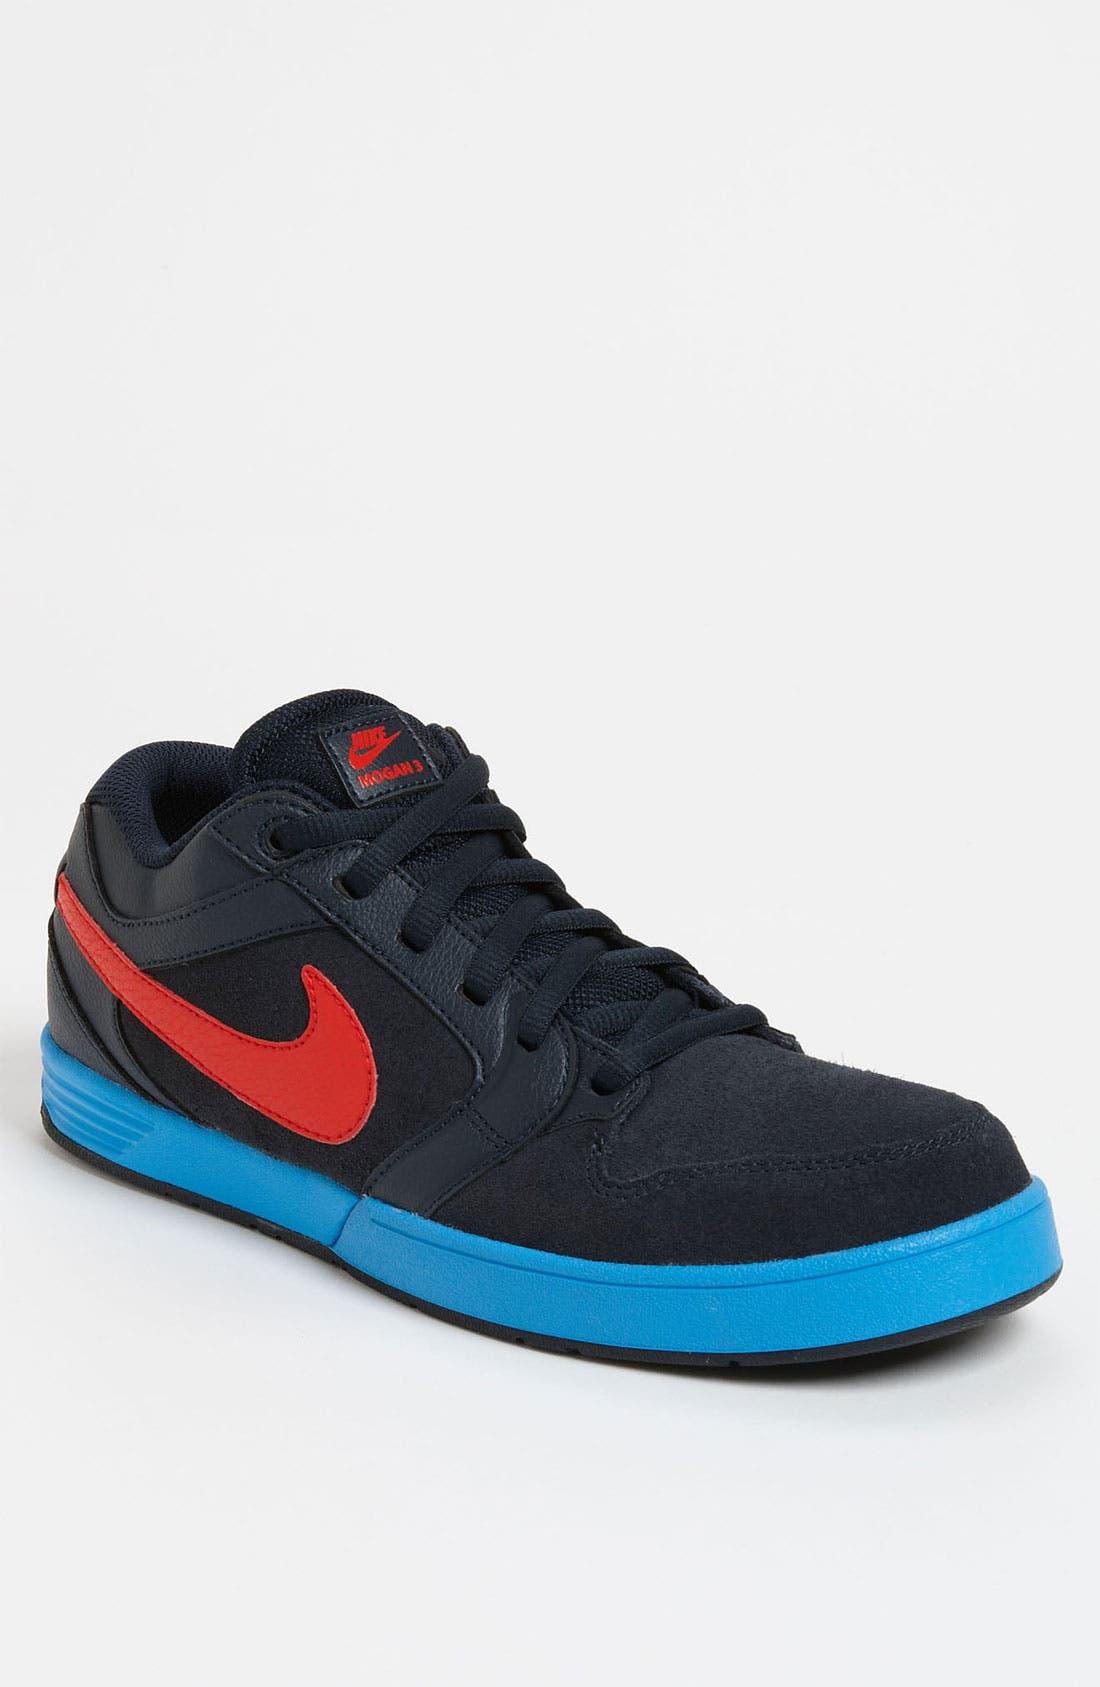 Alternate Image 1 Selected - Nike 'Mogan 3' Sneaker (Men) (Online Only)